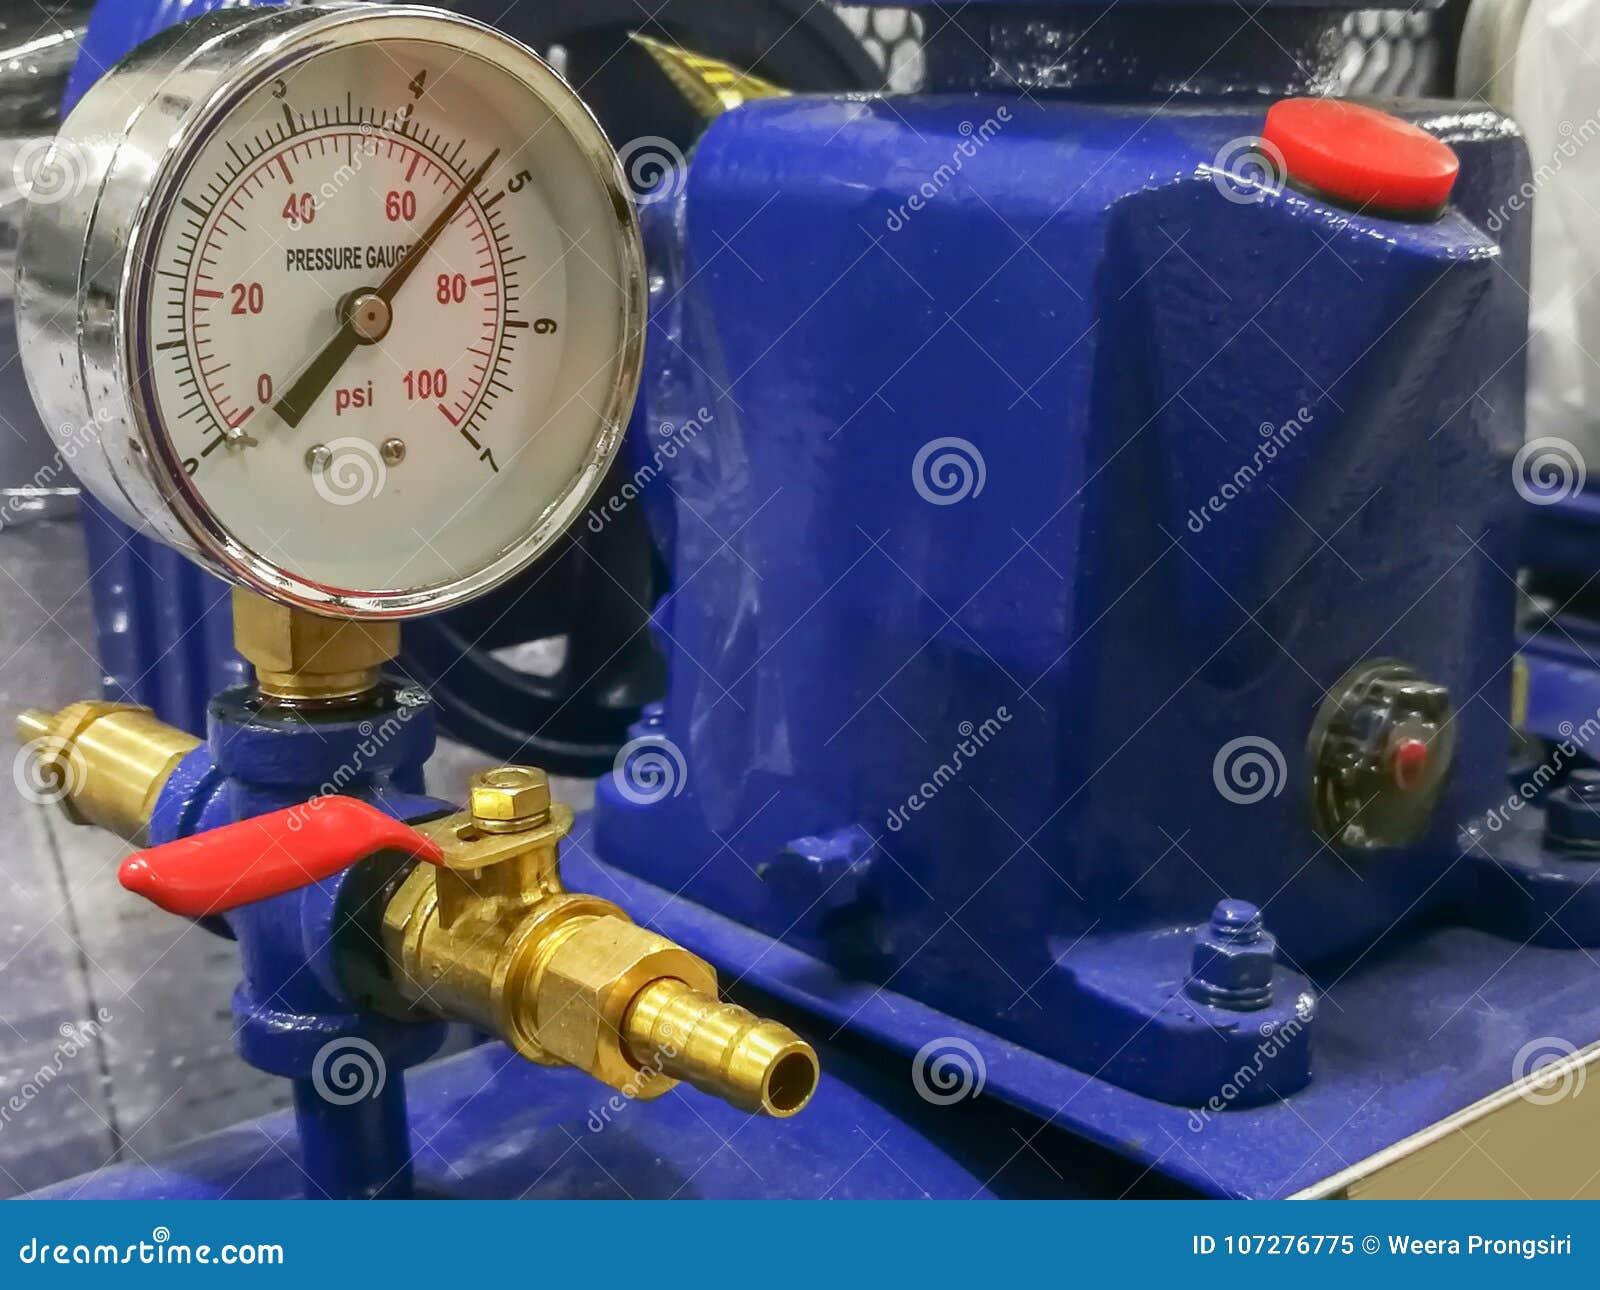 Compressor, Machine Part, Machine Valve, Metal Stock Image - Image